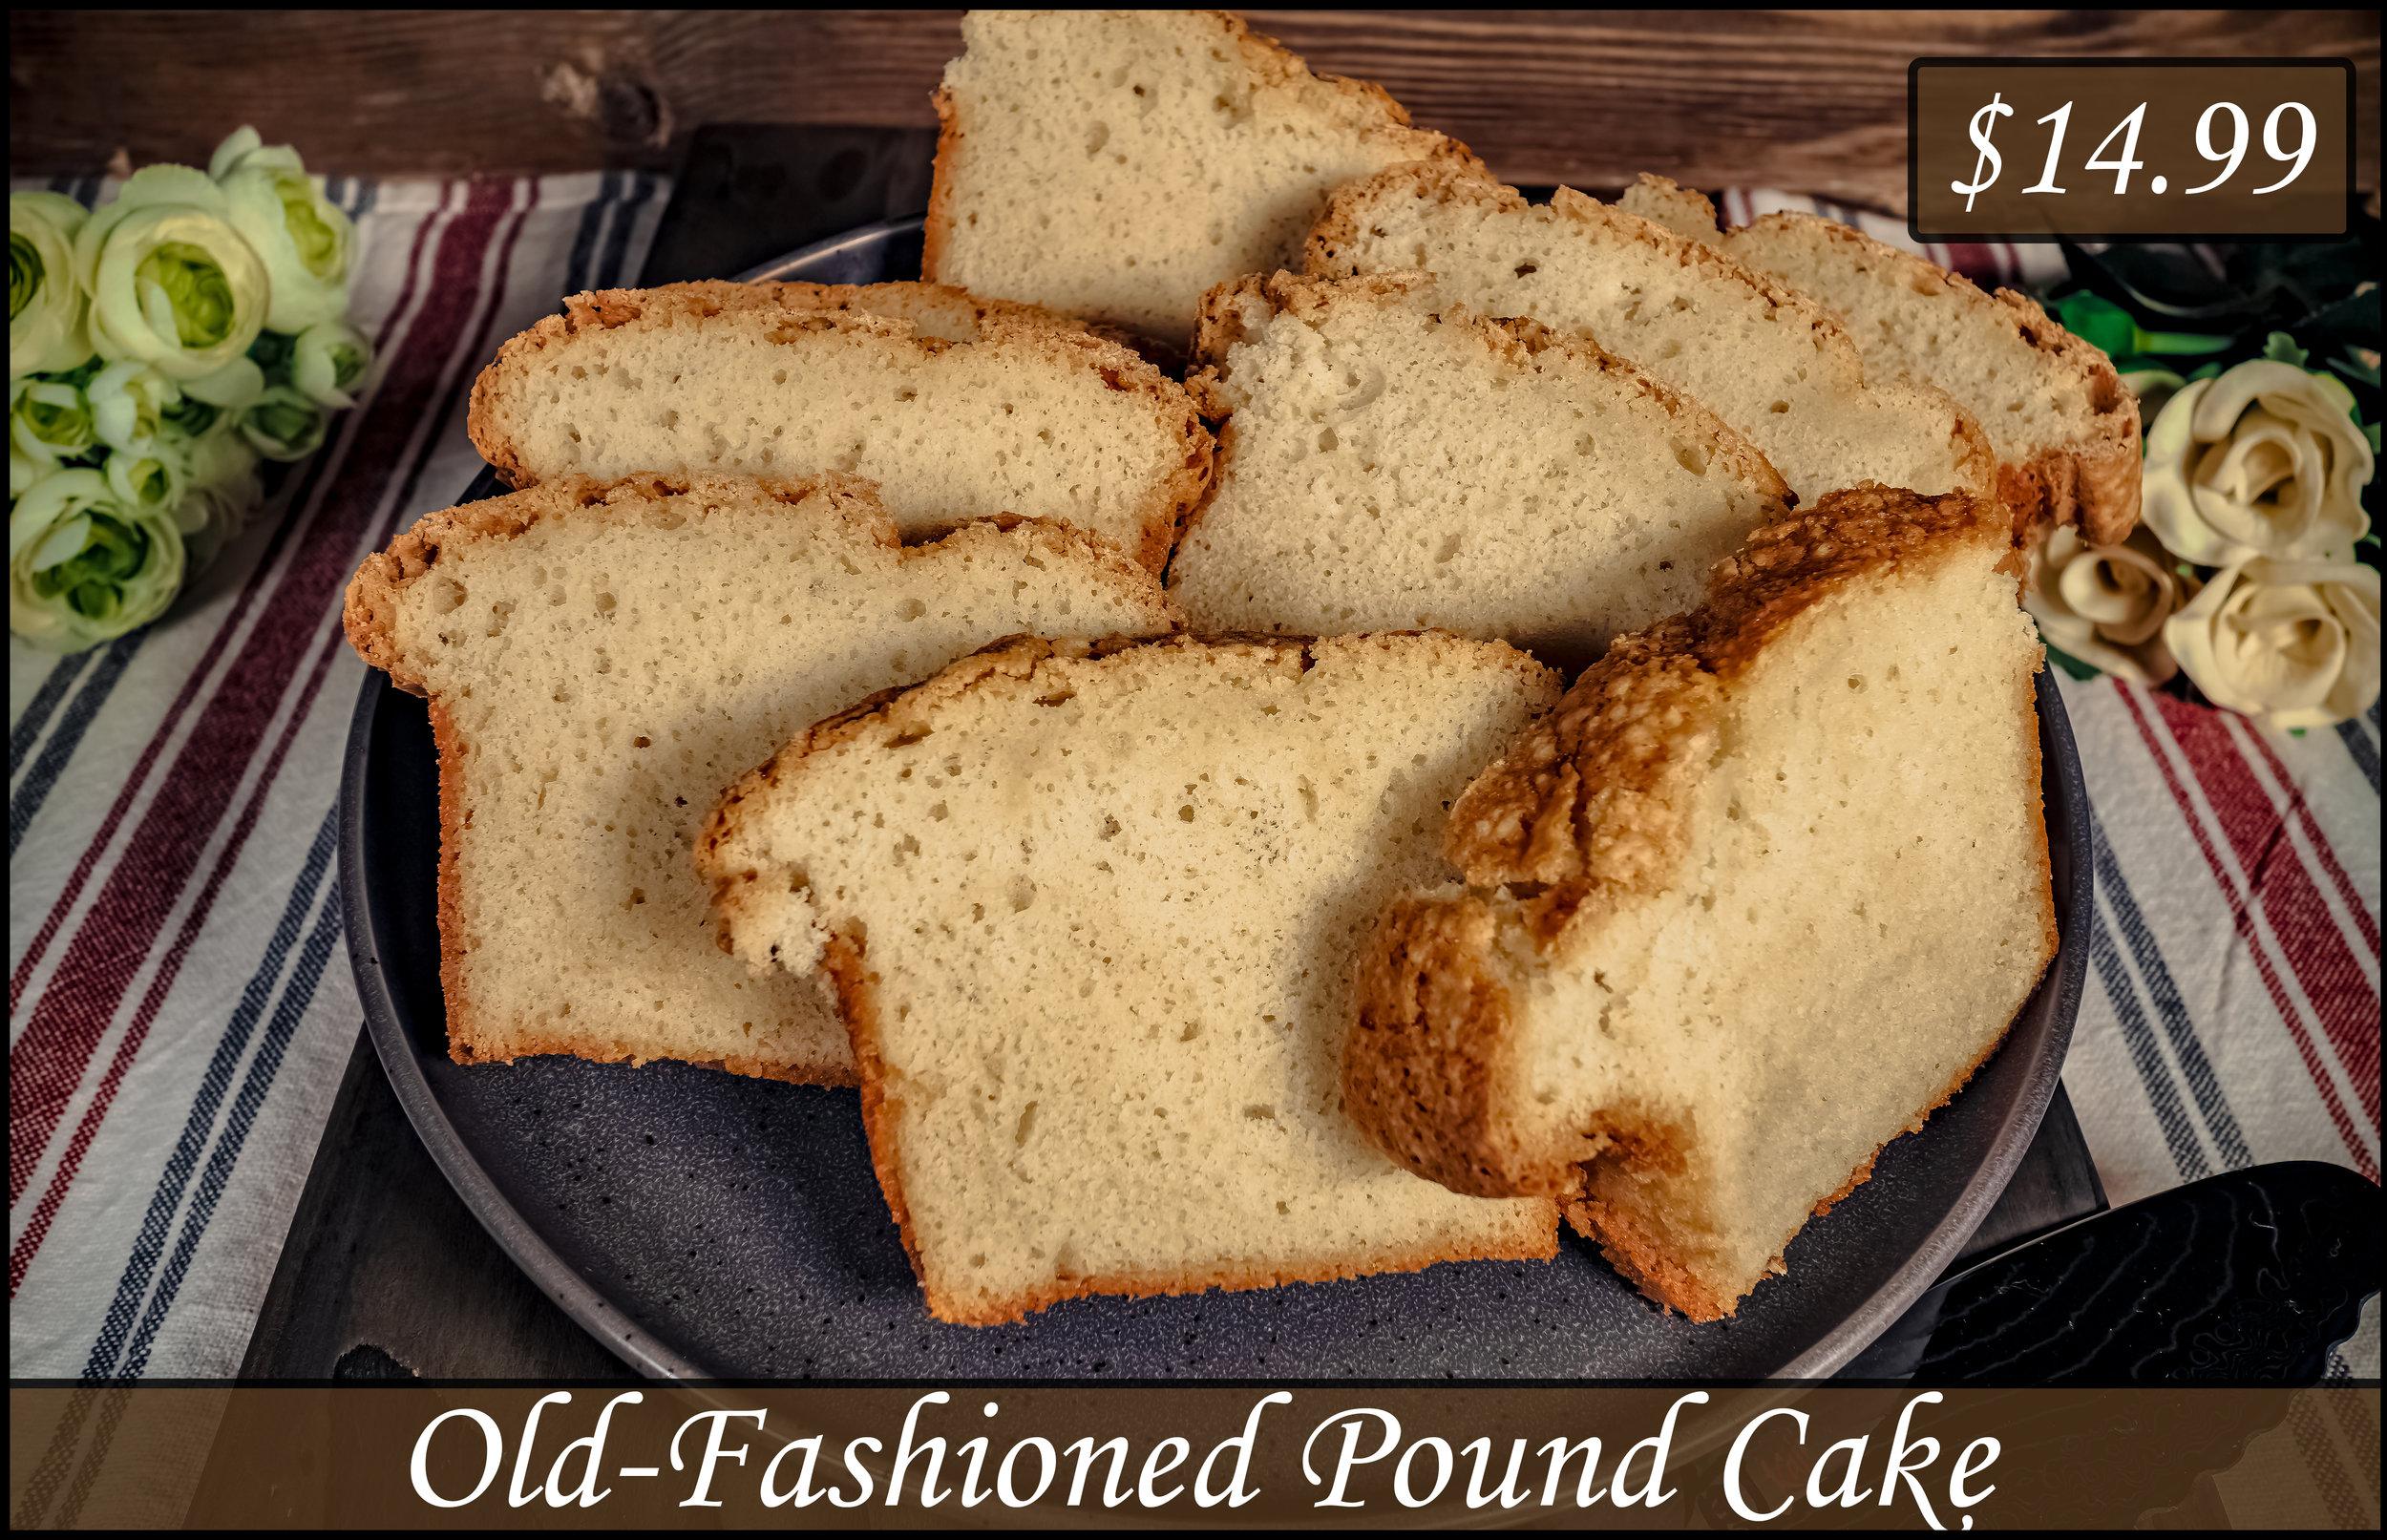 Old-Fashioned Pound Cake.jpg